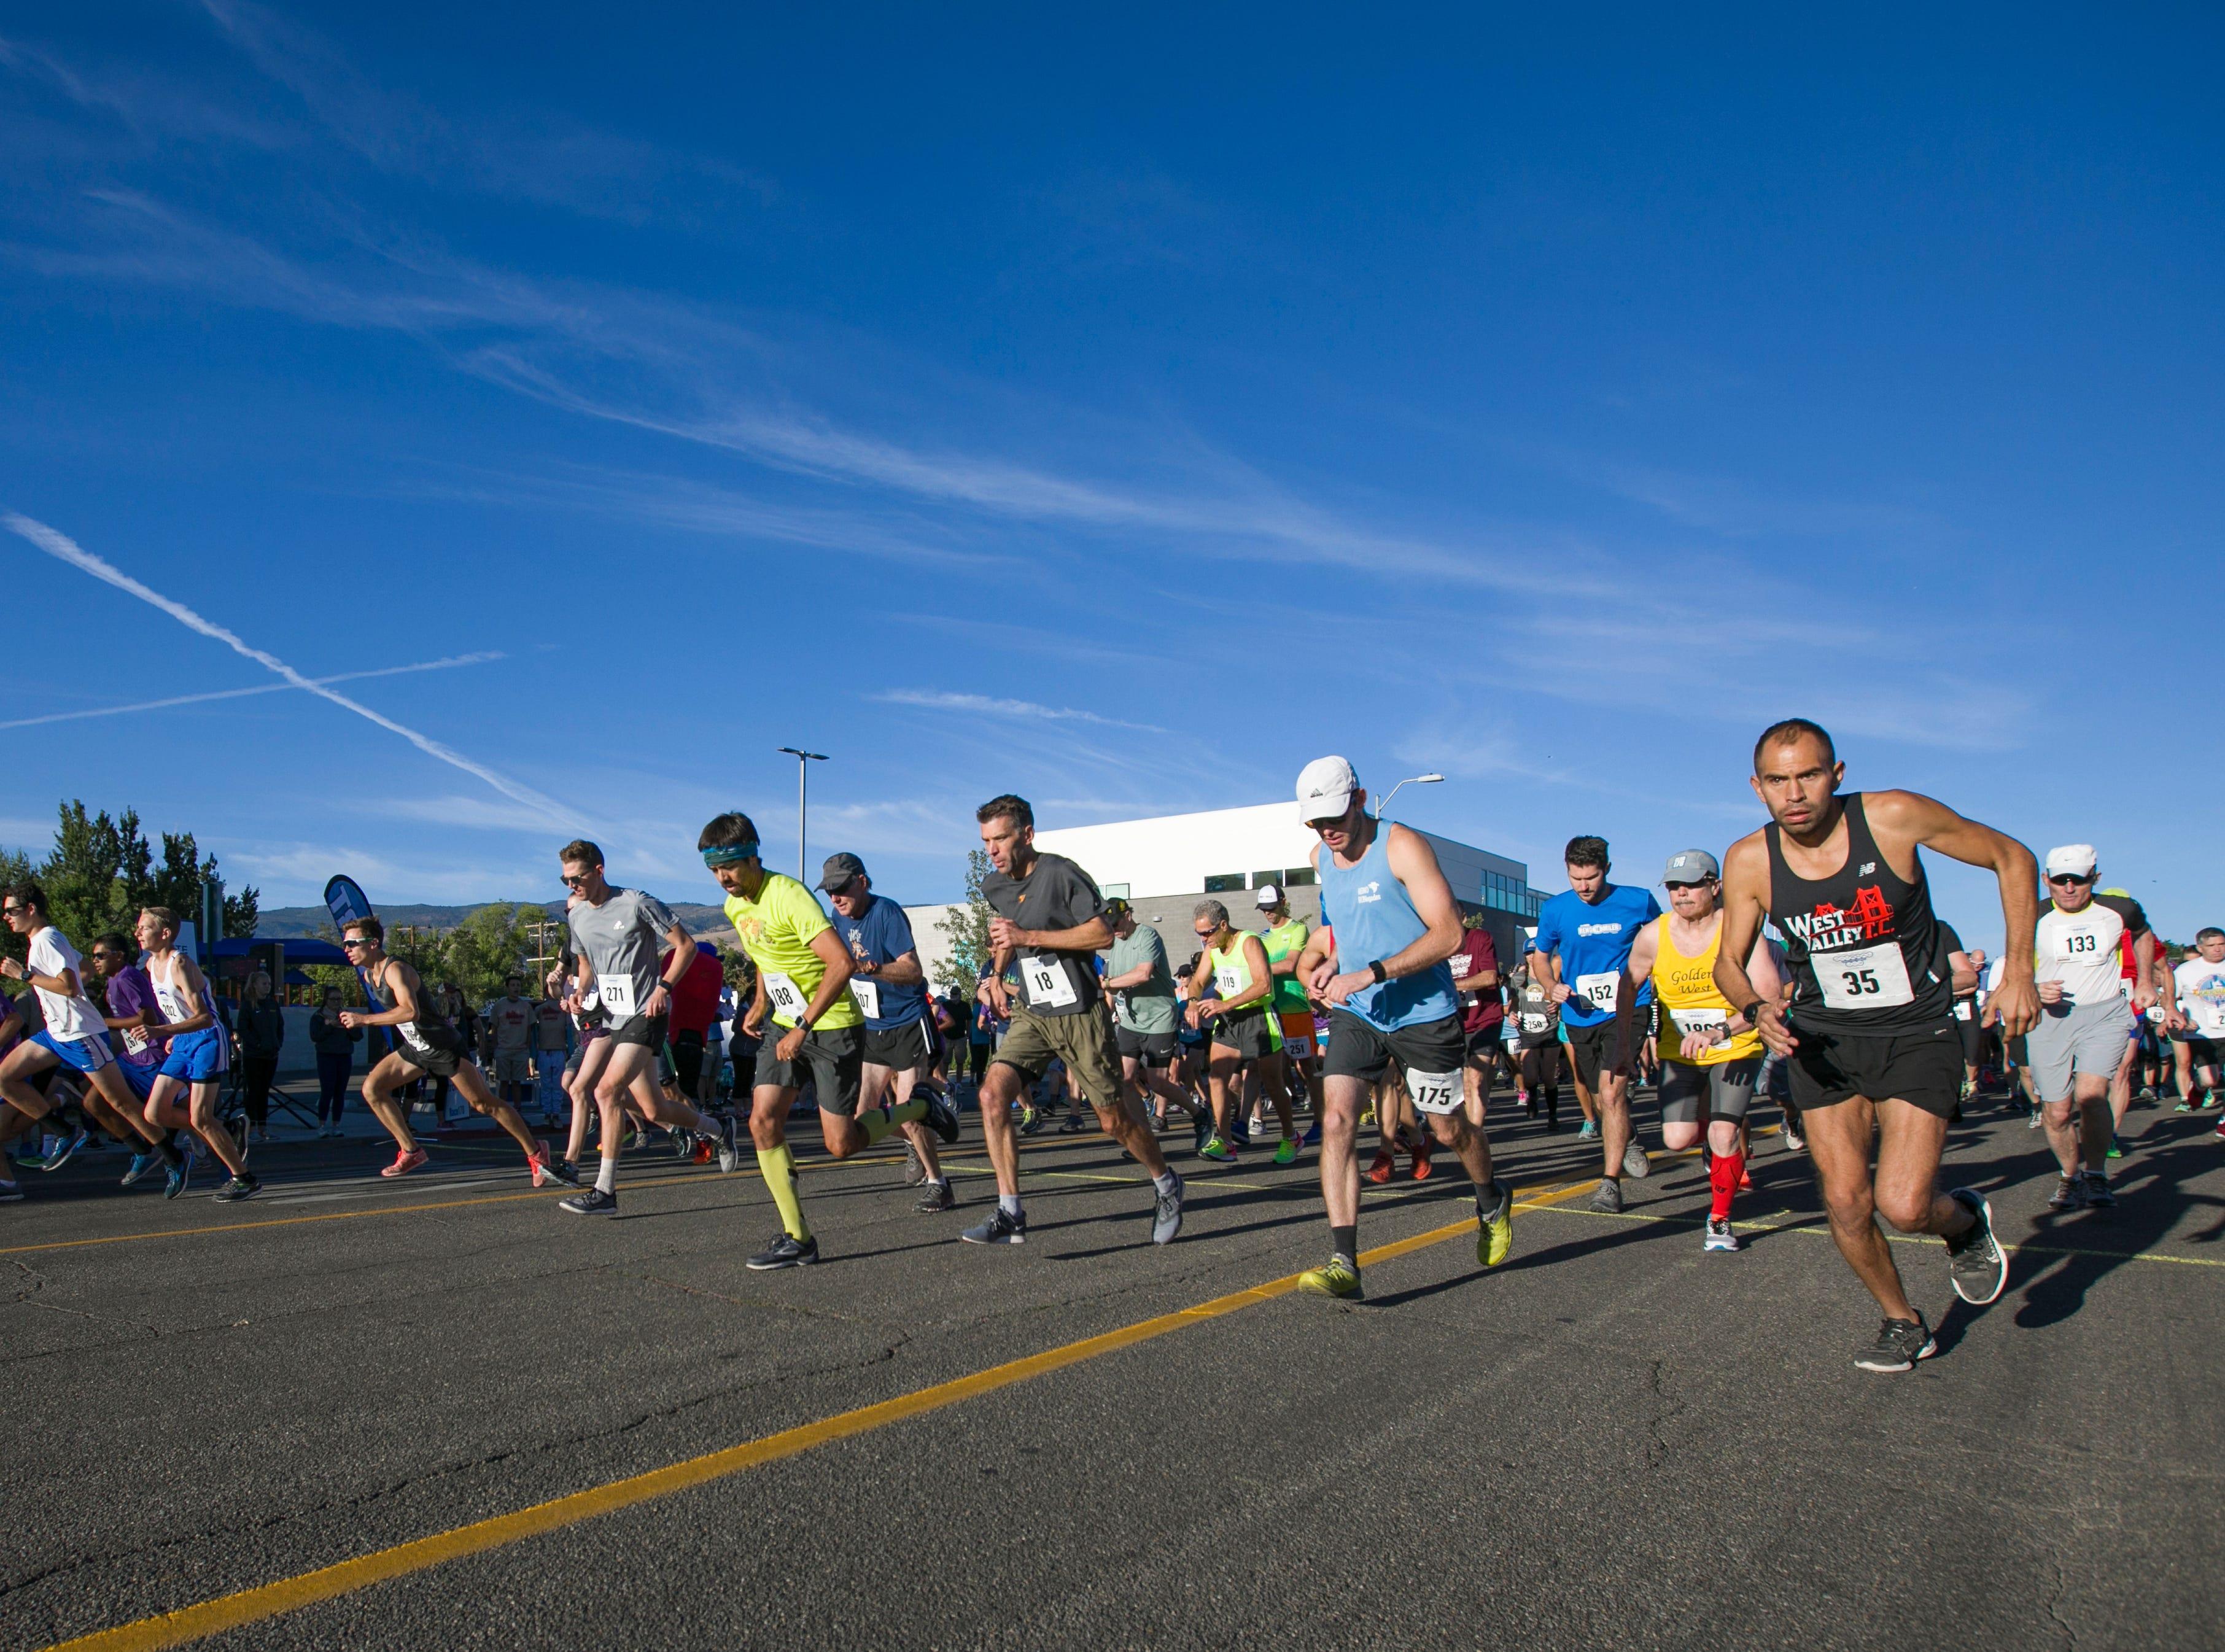 Runners start the 50th Annual Journal Jog in Reno, Nevada on Sunday, September 9, 2018.